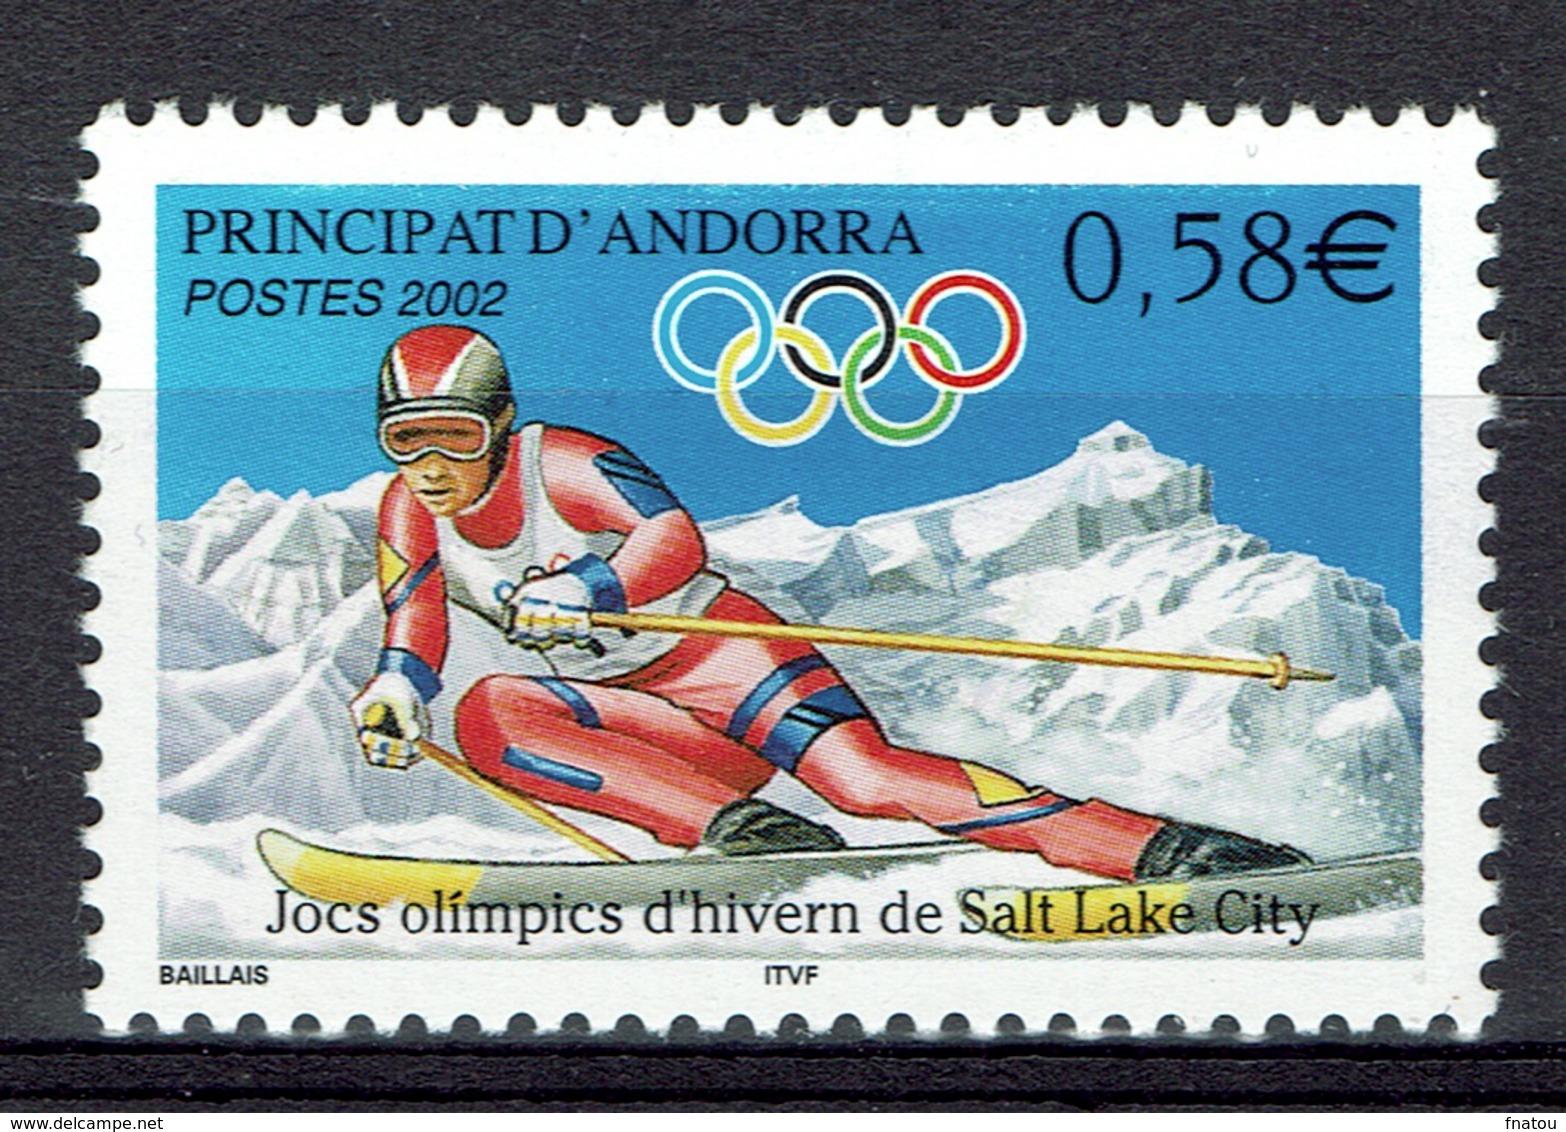 Andorra (French Adm.), Winter Olympics, Salt Lake City (USA), 2002, MNH VF - French Andorra